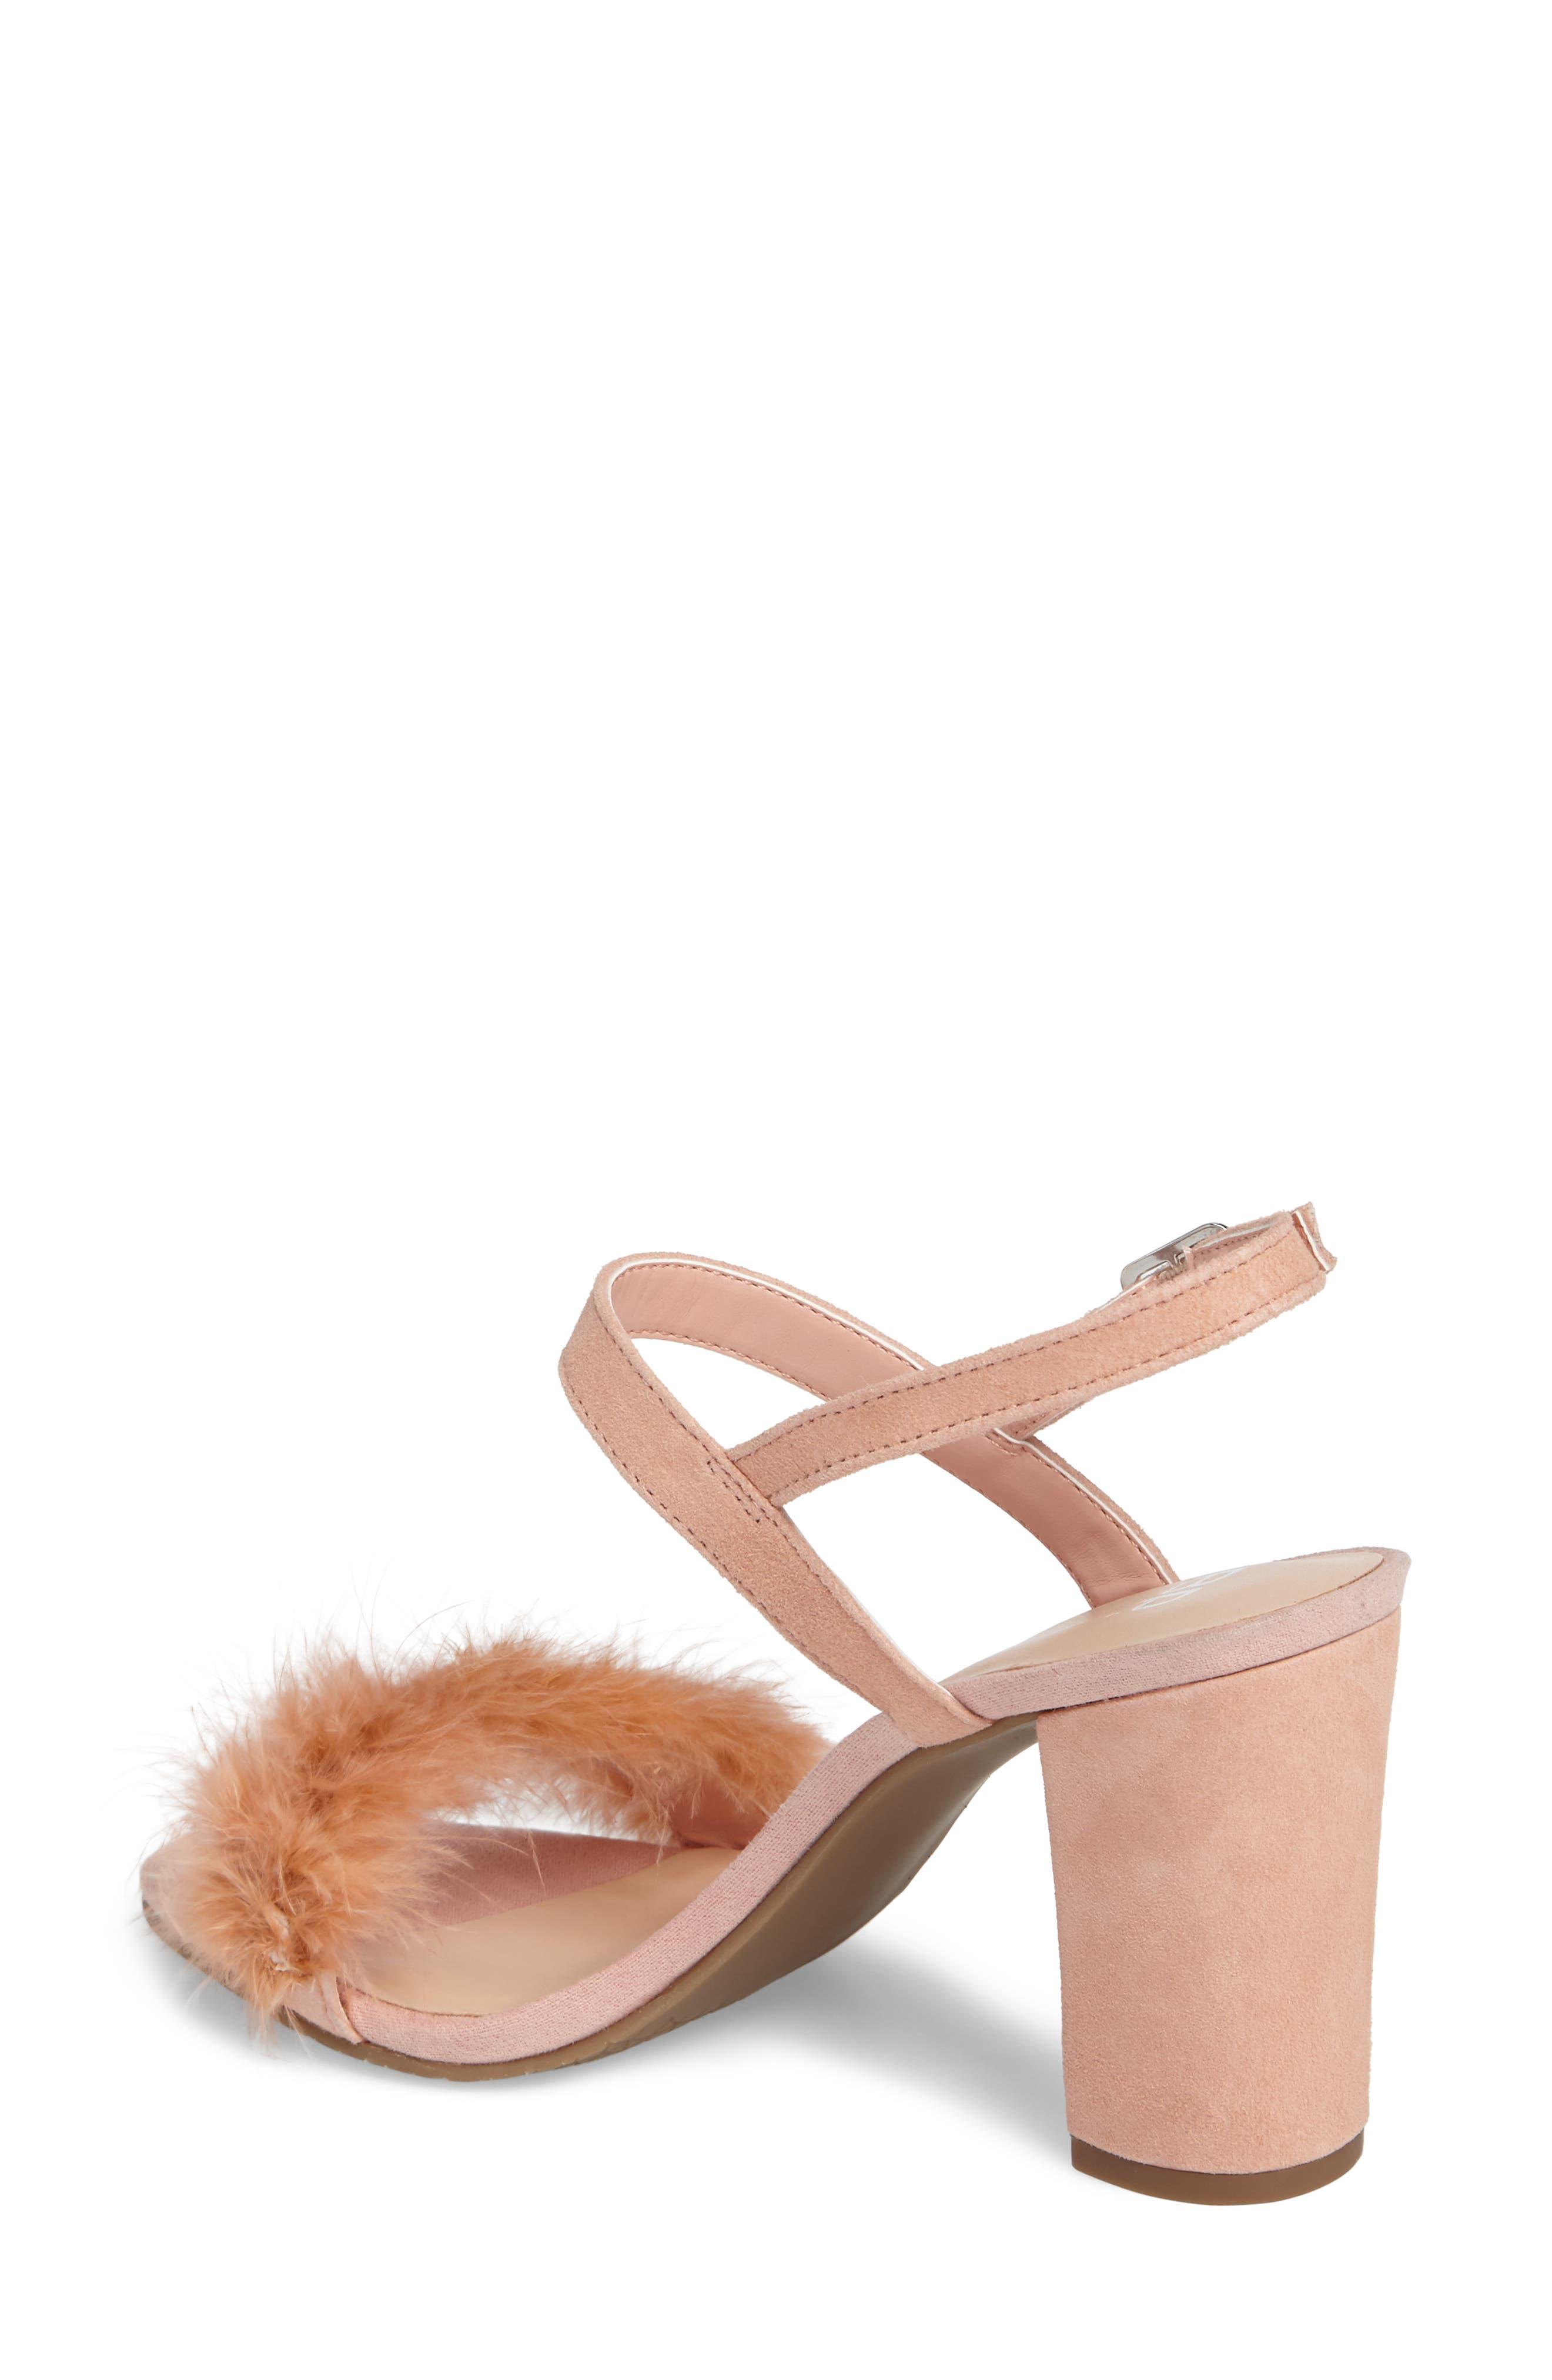 Lula Block Heel Slingback Sandal,                             Alternate thumbnail 2, color,                             Blush Feathers